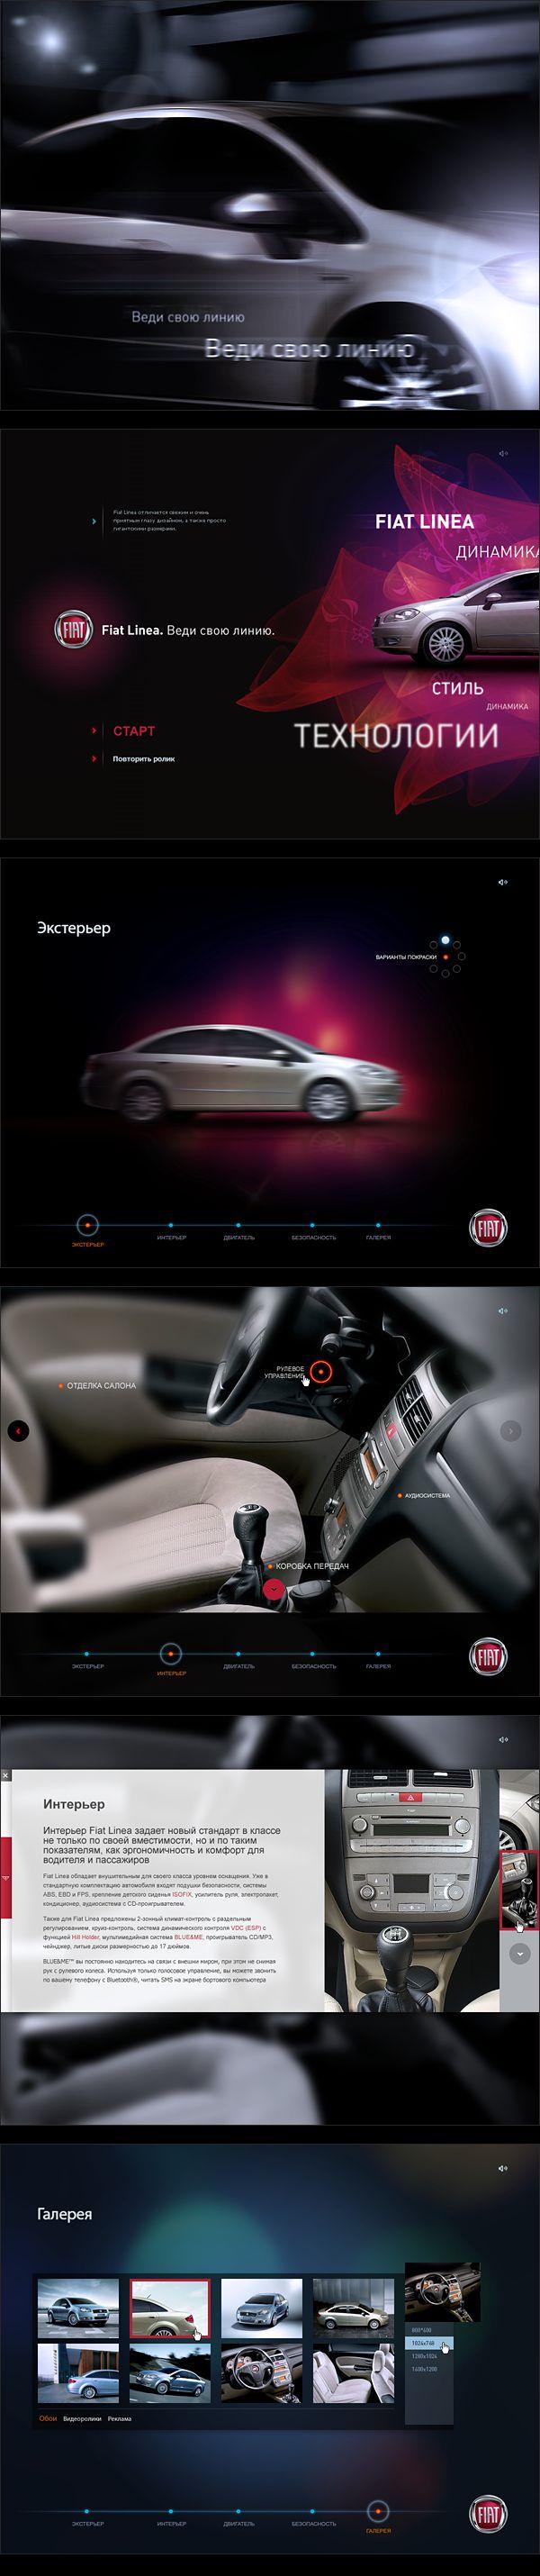 Fiat Linea presentation by Kravtsov Studio, via Behance